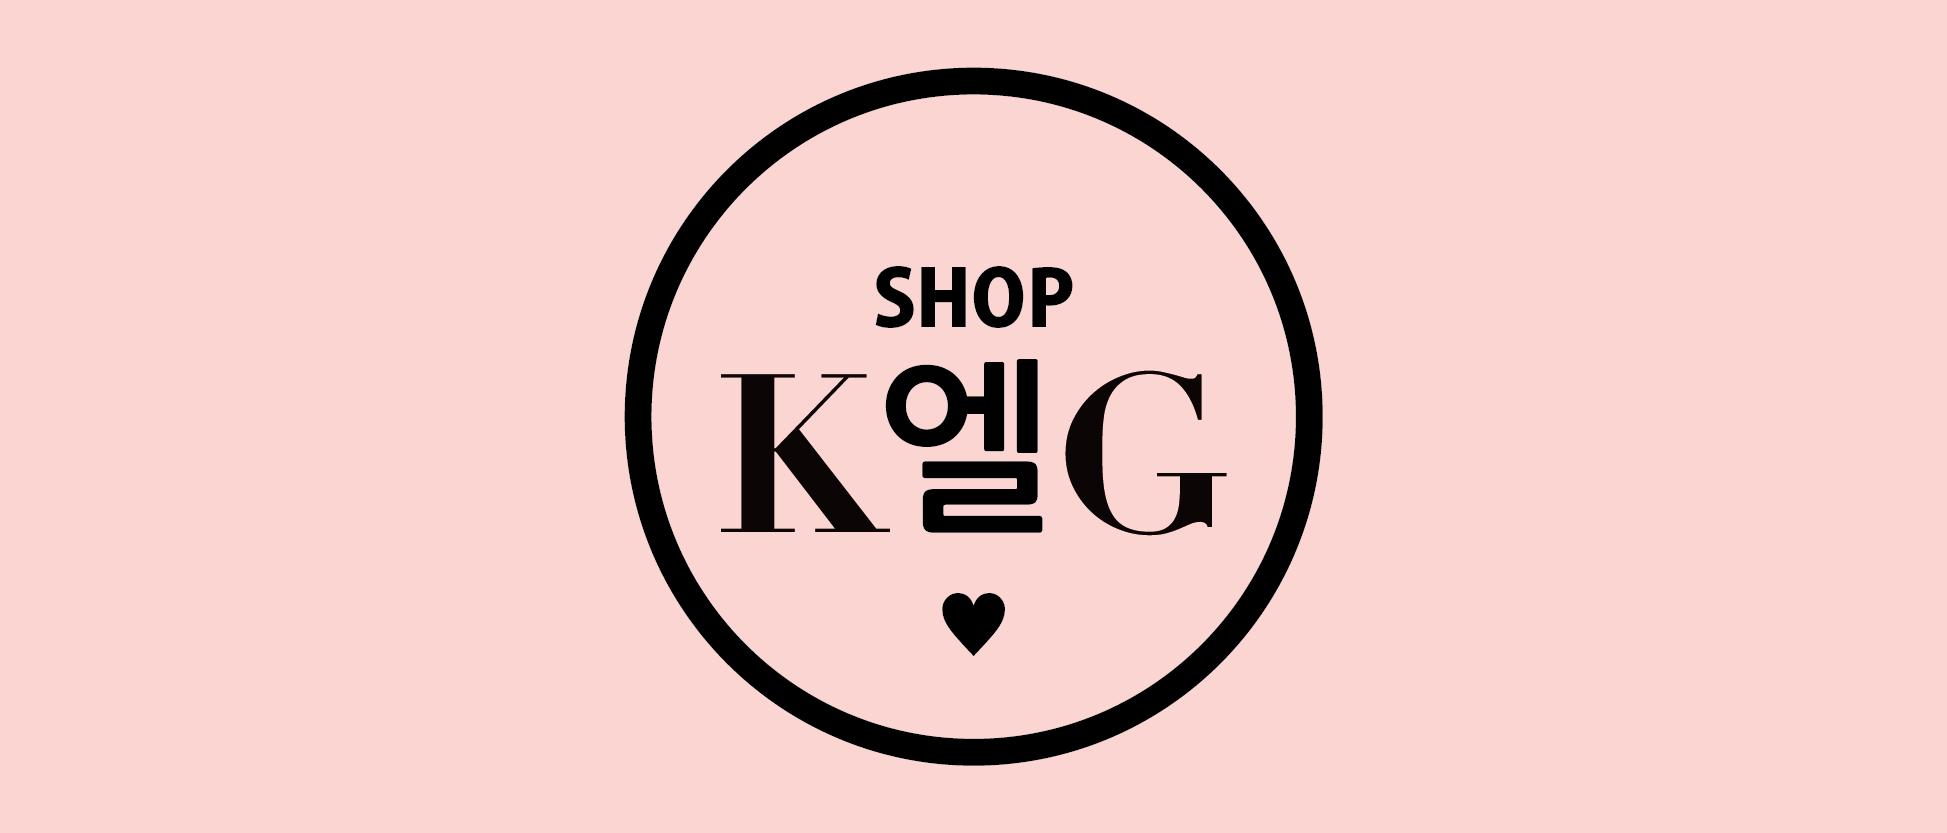 SHOP KLG